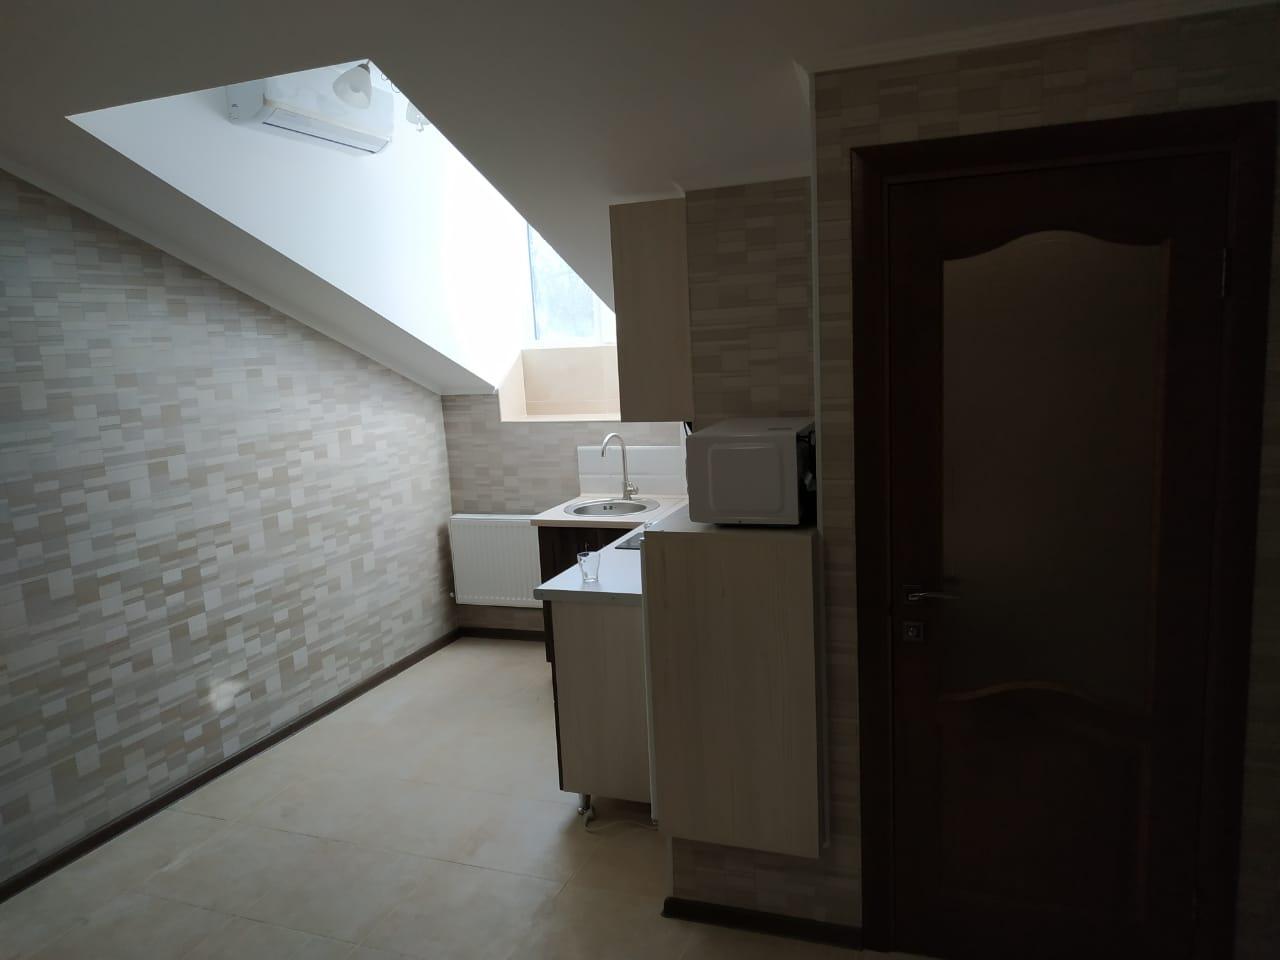 Квартира 125кв.м. Французский бульвар, для арендного бизнеса